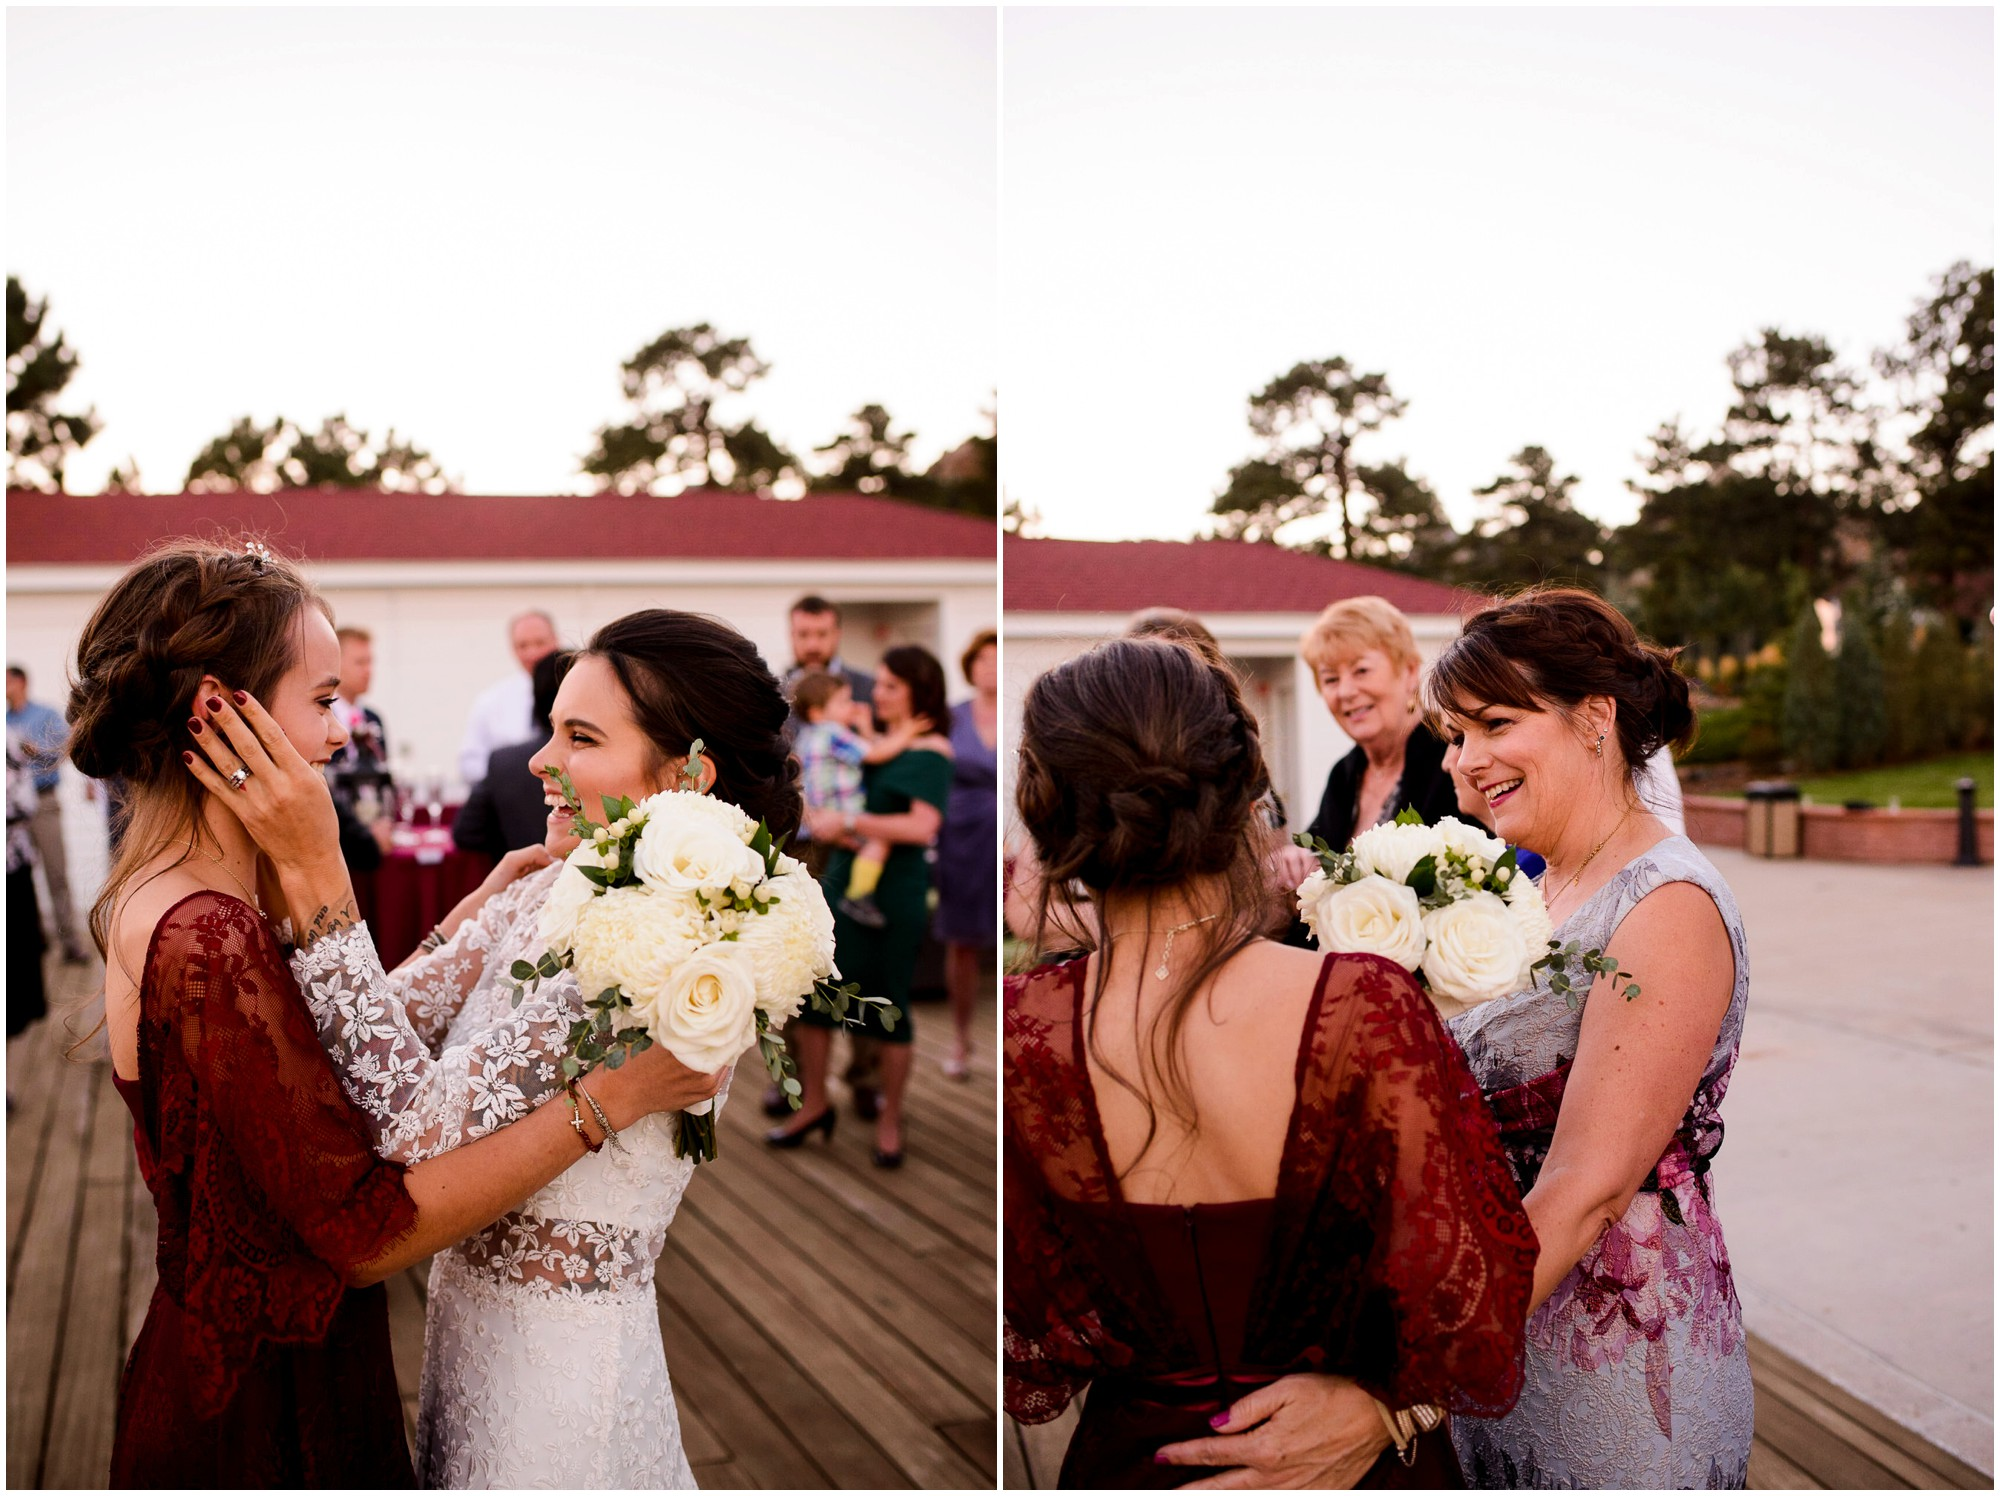 205-Estes-Park-Stanley-hotel-fall-wedding.jpg